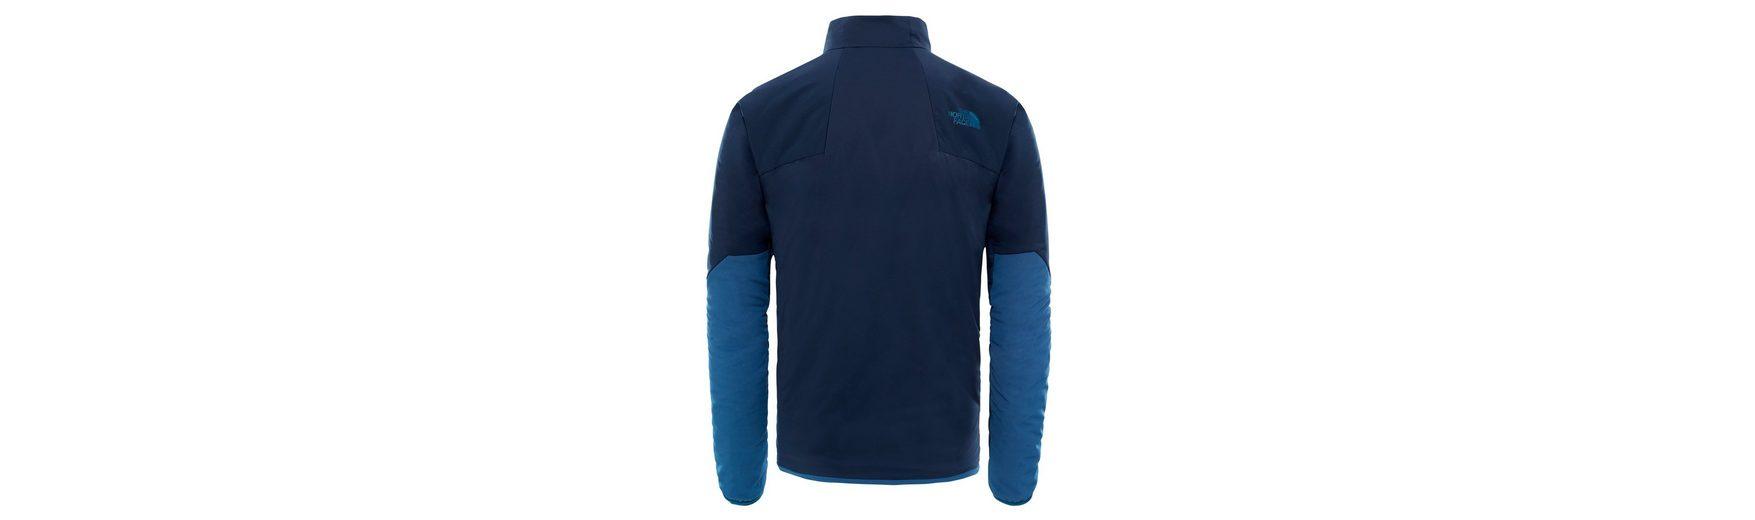 The North Face Outdoorjacke Ventrix Jacket Men Steckdose Zahlen Mit Paypal q3LdJ